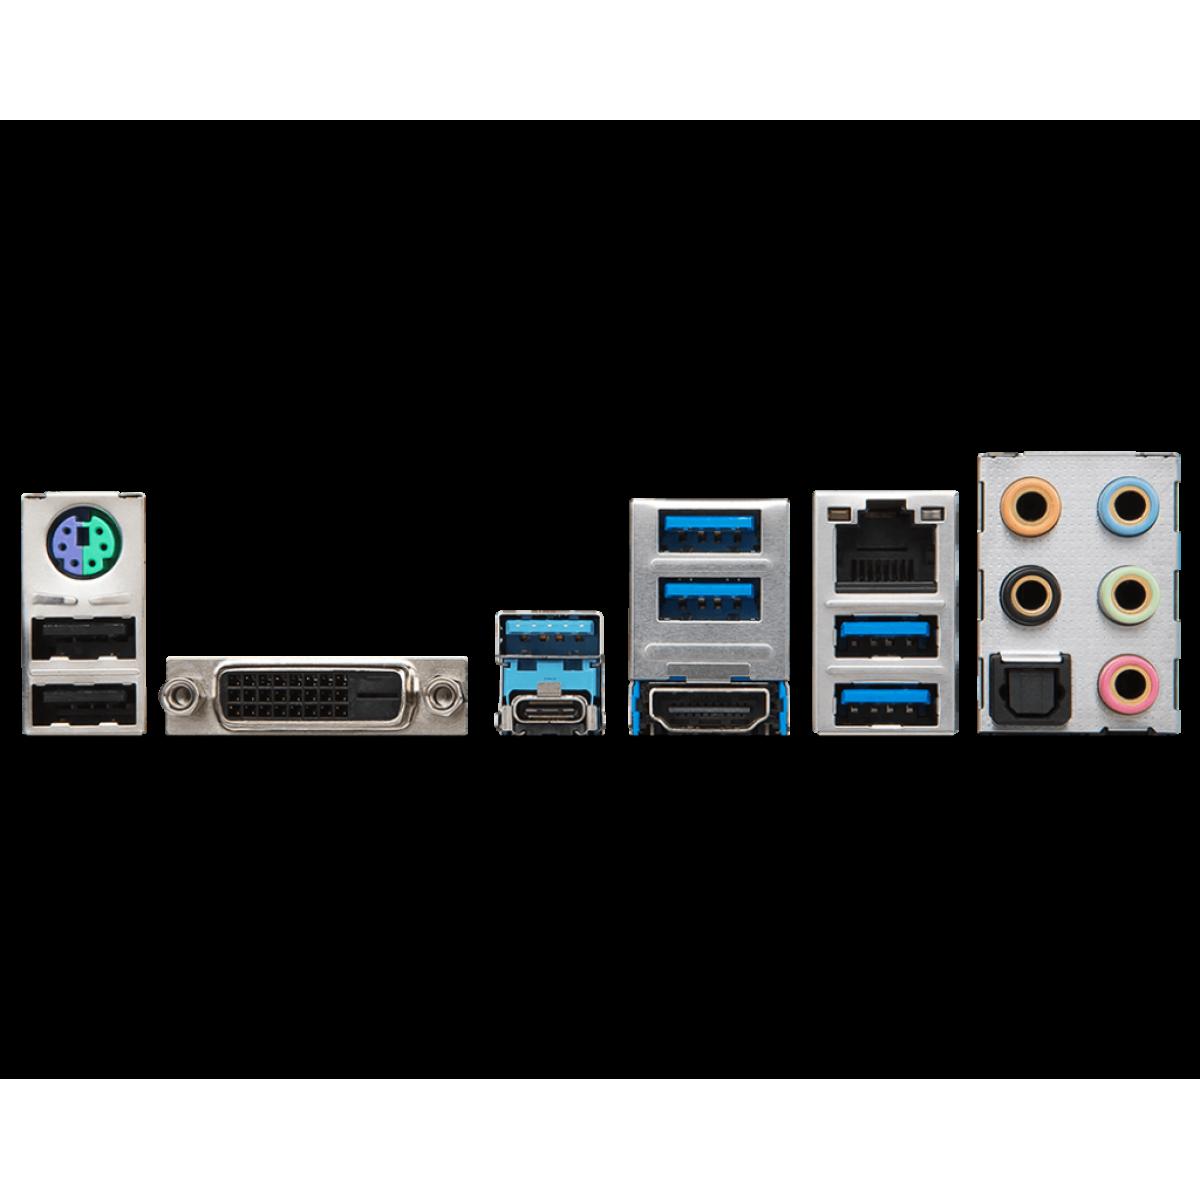 Placa Mãe MSI Z370 KRAIT GAMING, Chipset Z370, Intel LGA 1151, ATX DDR4